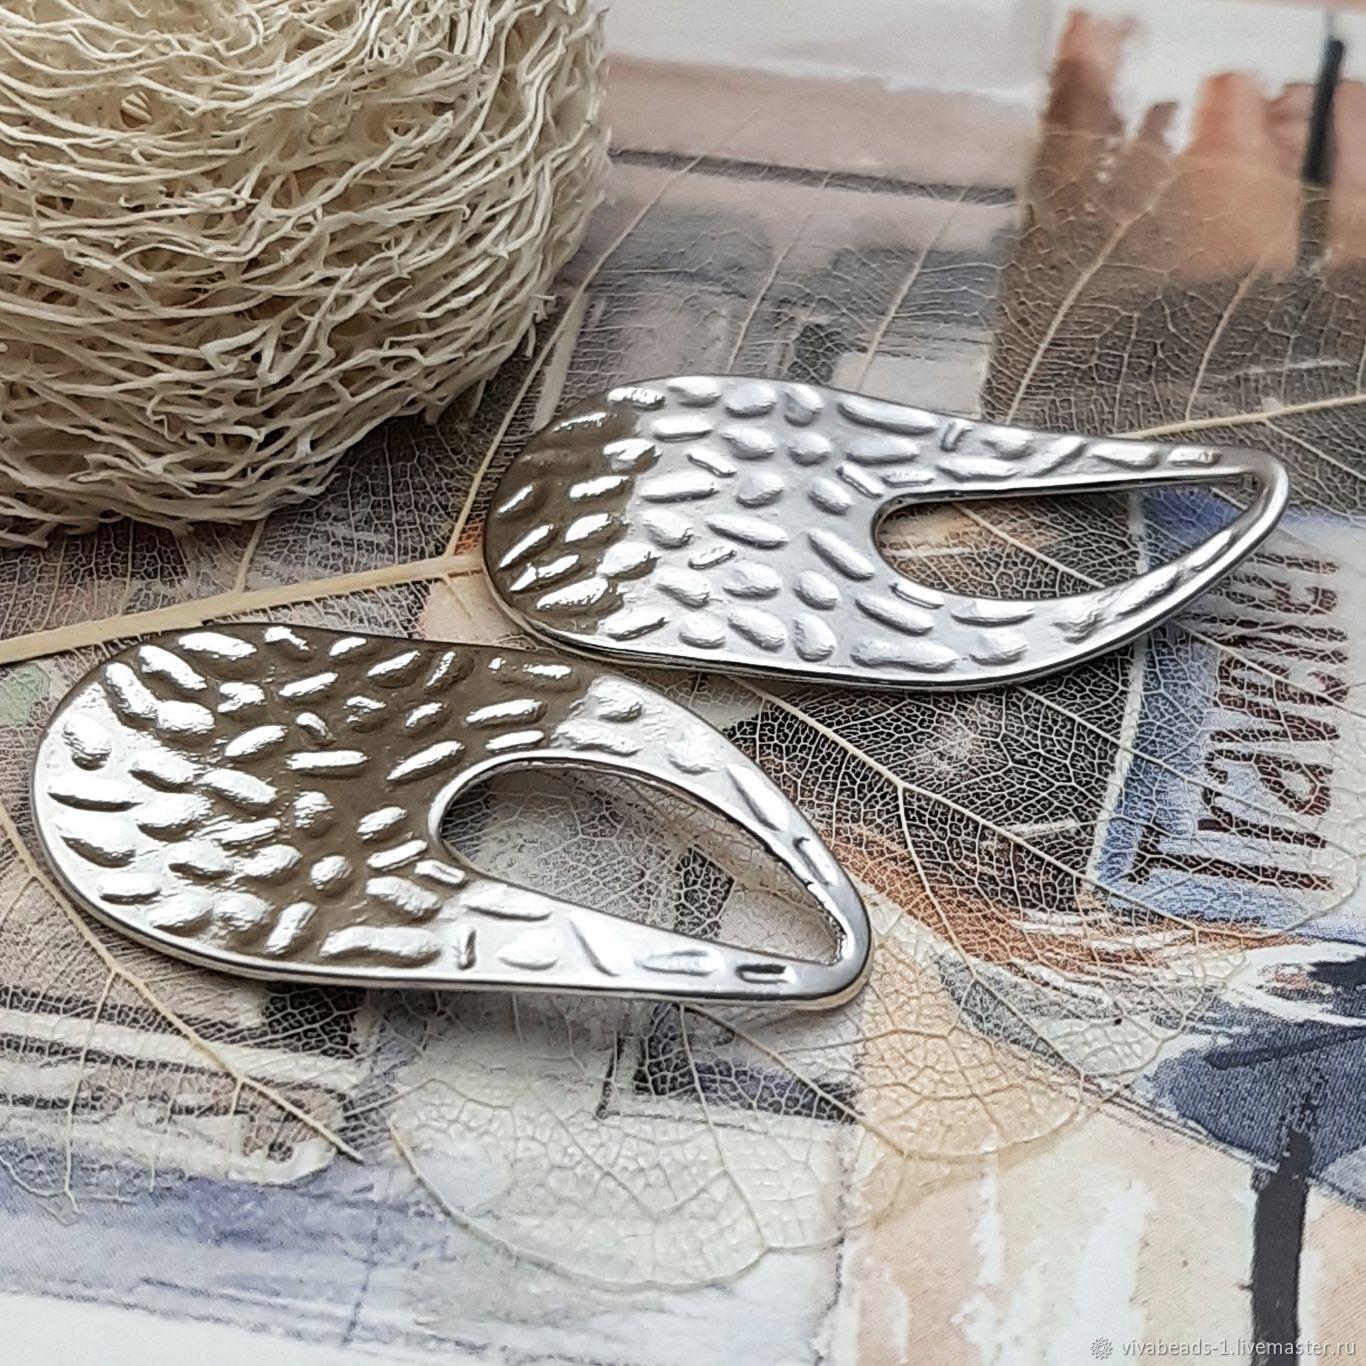 Pendant wavy 34h18 mm platinum (3579), Pendants, Voronezh,  Фото №1